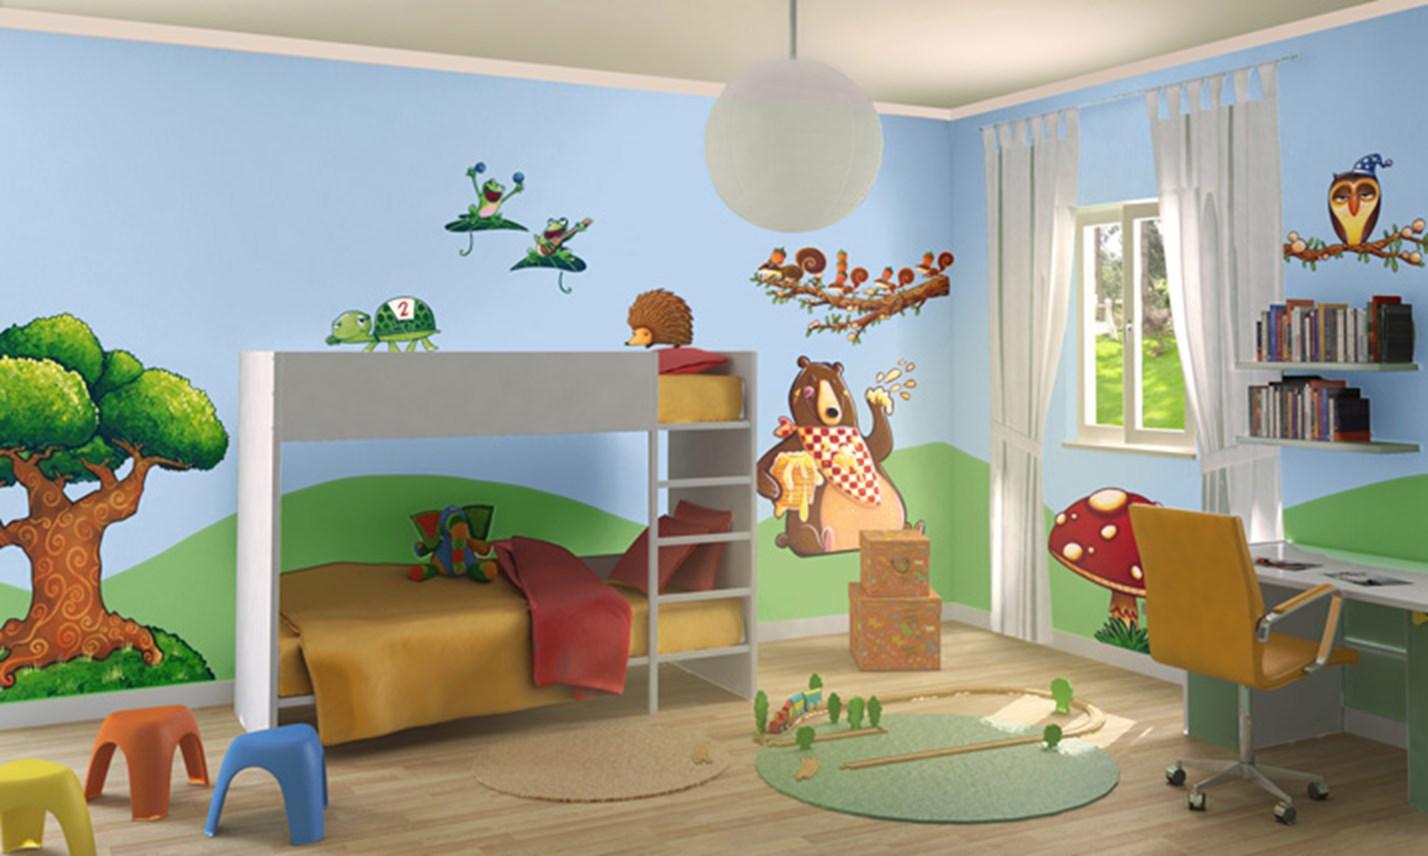 Dipinti Murali Per Camerette stickers murali bambini - cameretta nel bosco | leostickers